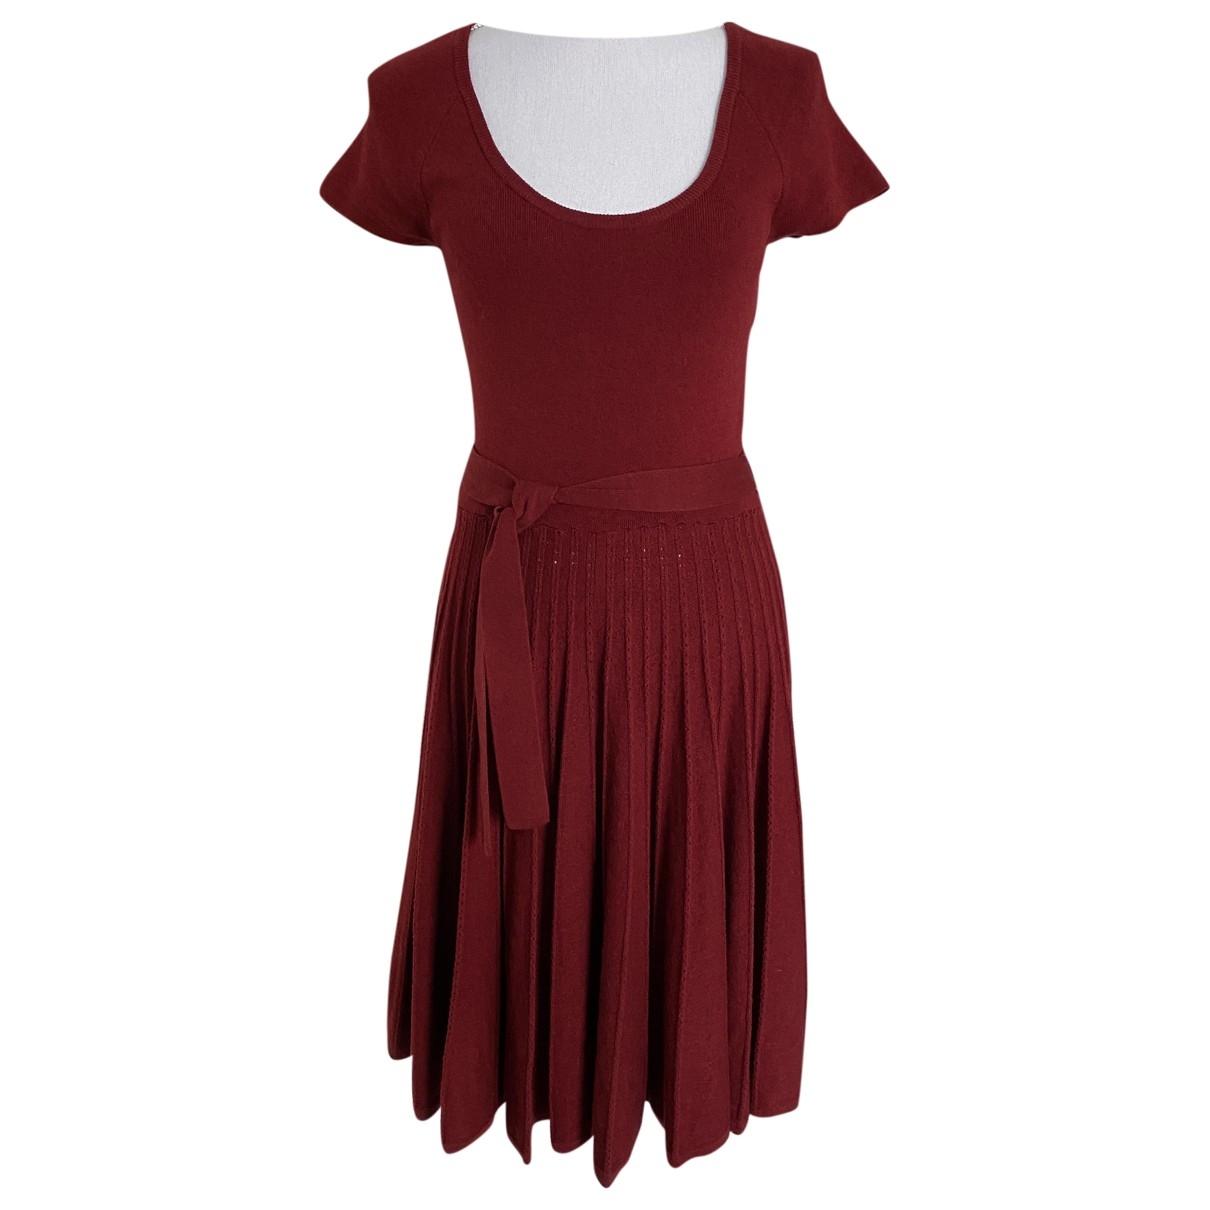 Bcbg Max Azria \N Burgundy Wool dress for Women M International